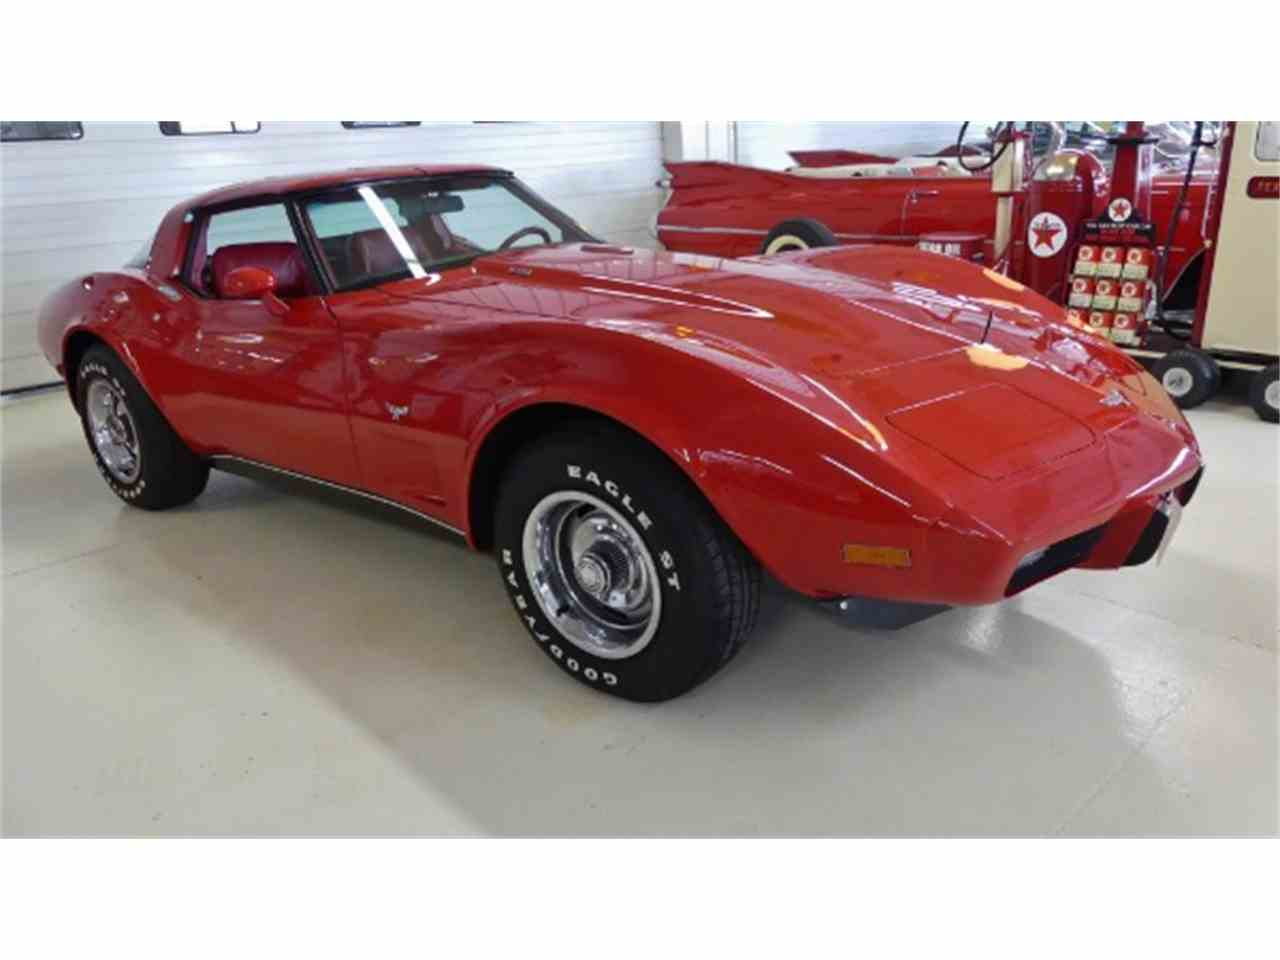 1979 Chevrolet Corvette for Sale - CC-1001630